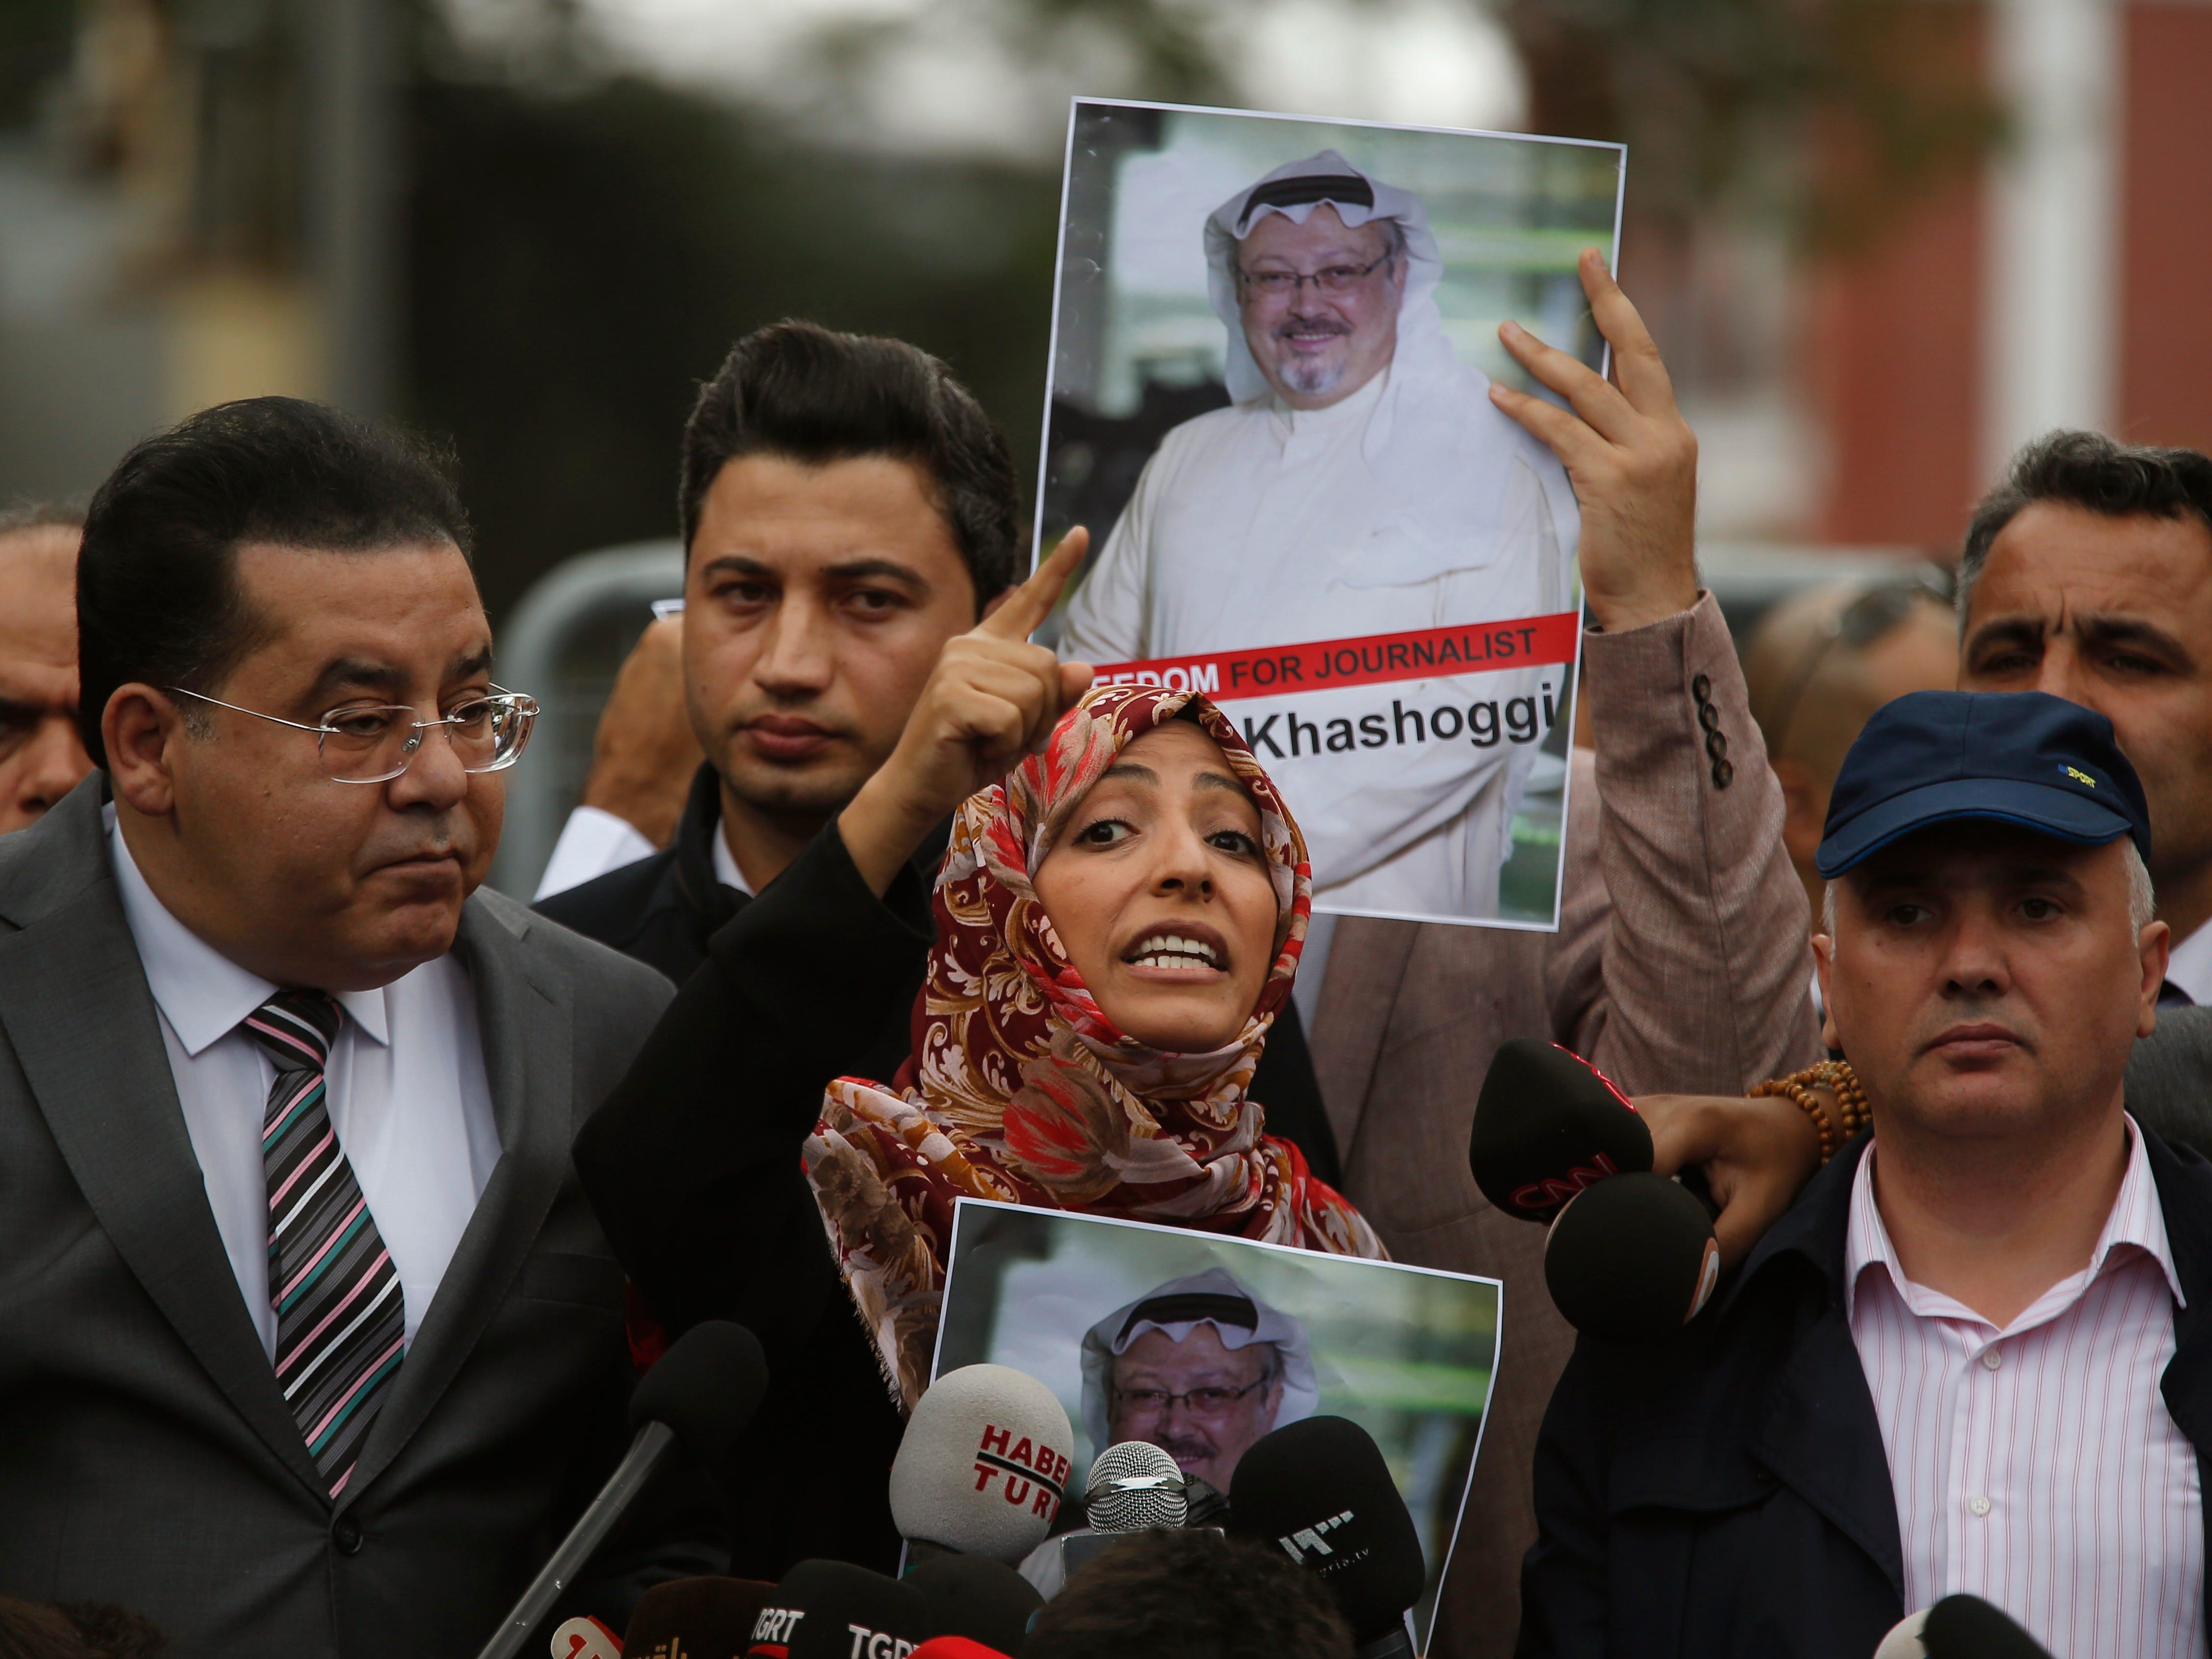 Tawakkol Karman, the Nobel Peace Prize laureate for 2011, gestures as she talks to members of the media about the disappearance of Saudi writer Jamal Khashoggi, near the Saudi Arabia consulate in Istanbul, Monday, Oct. 8, 2018.